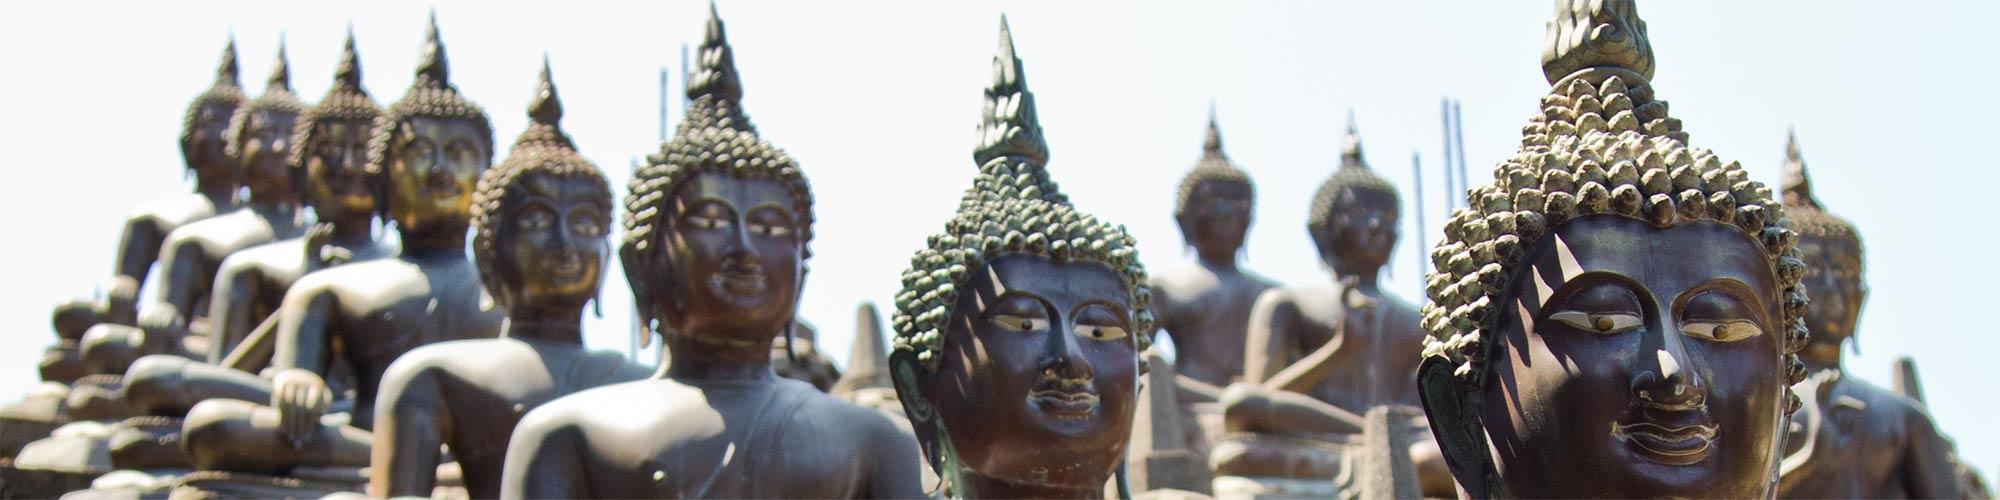 buddha-statues-colombo1.jpg